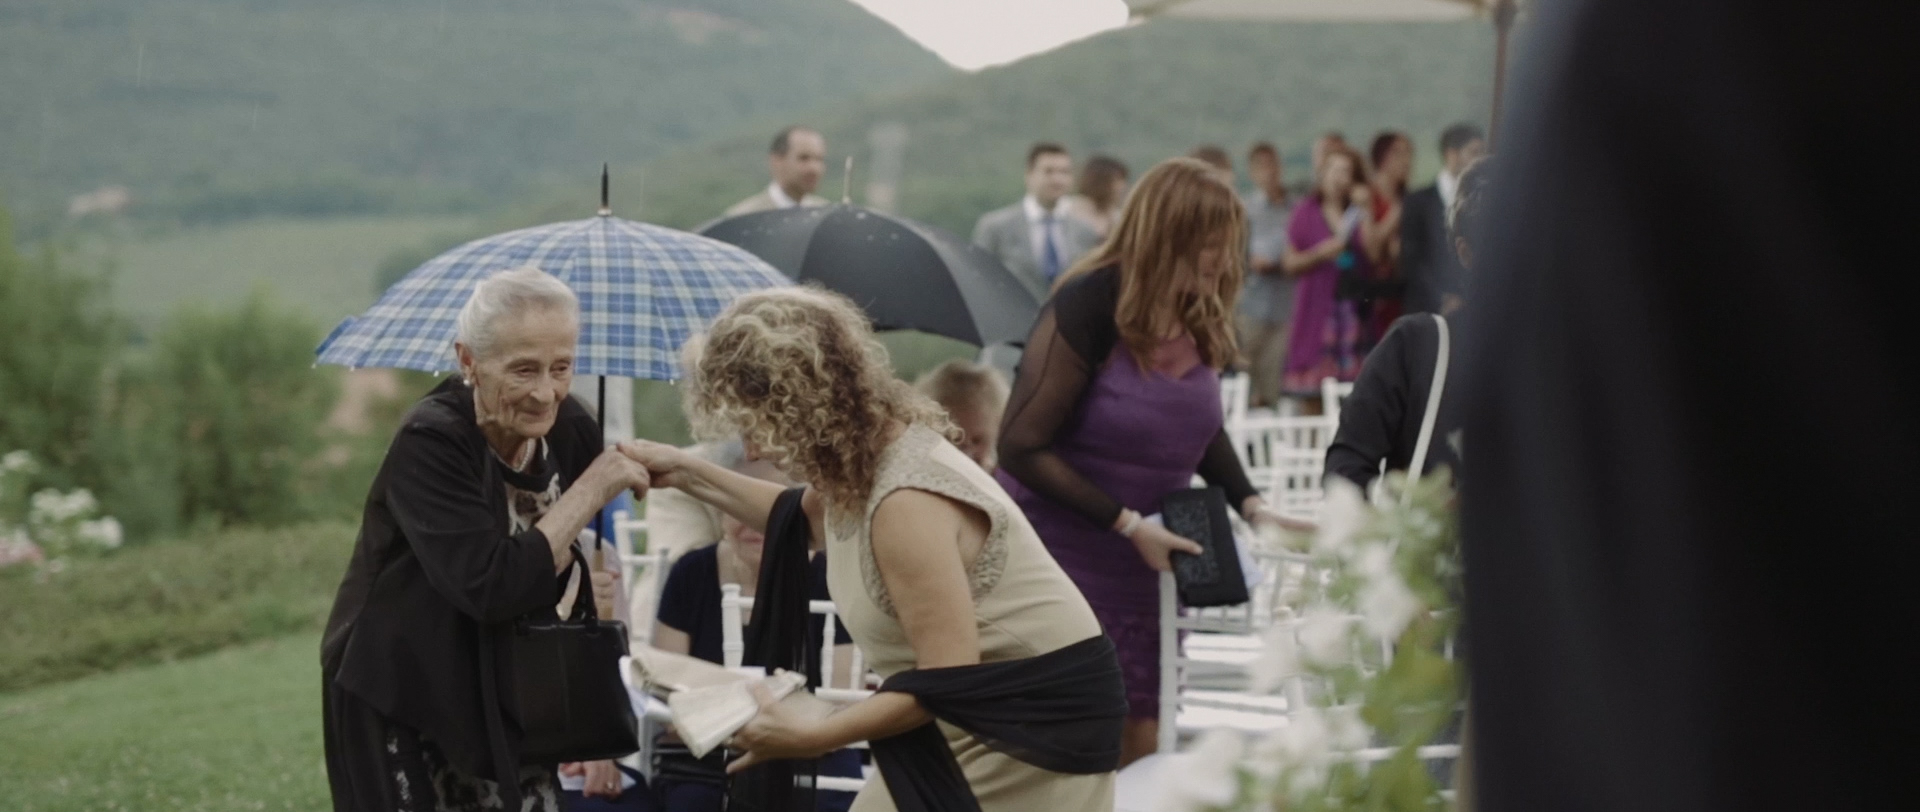 Frederic & Valentina | Trailer (Eng) 13